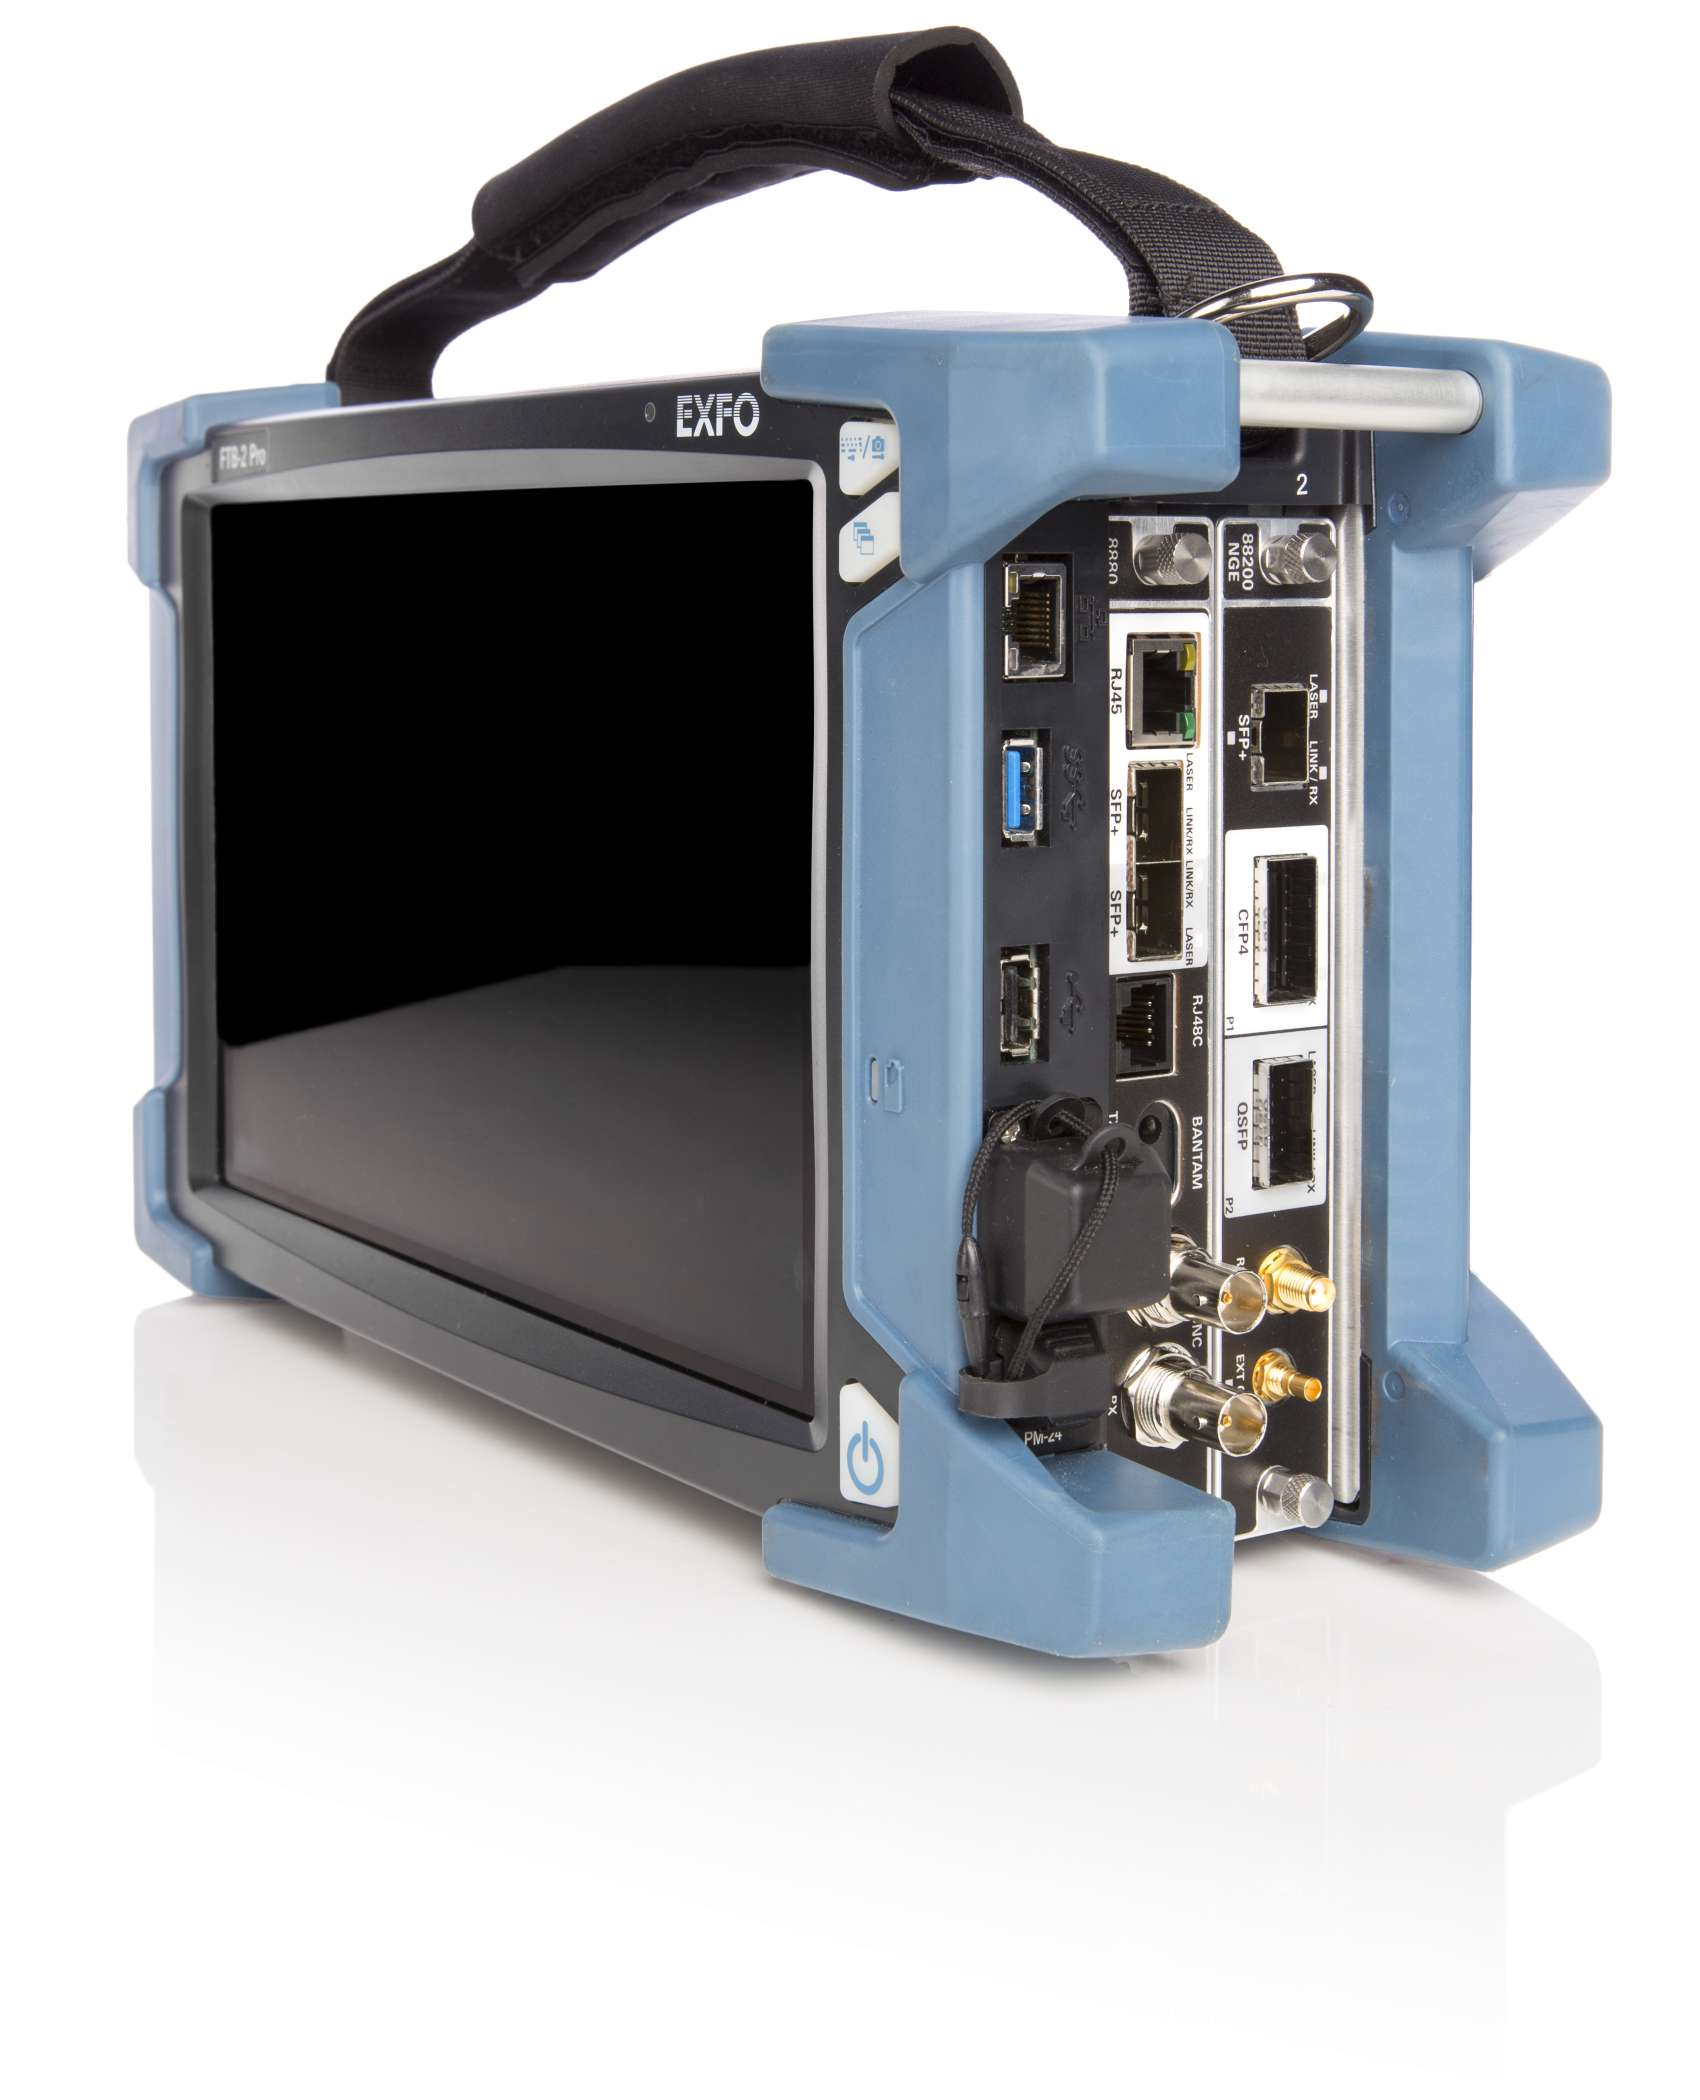 EXFO FTBx-8870/8880 Power Blazer : Анализатор транспортных сетей до 10G